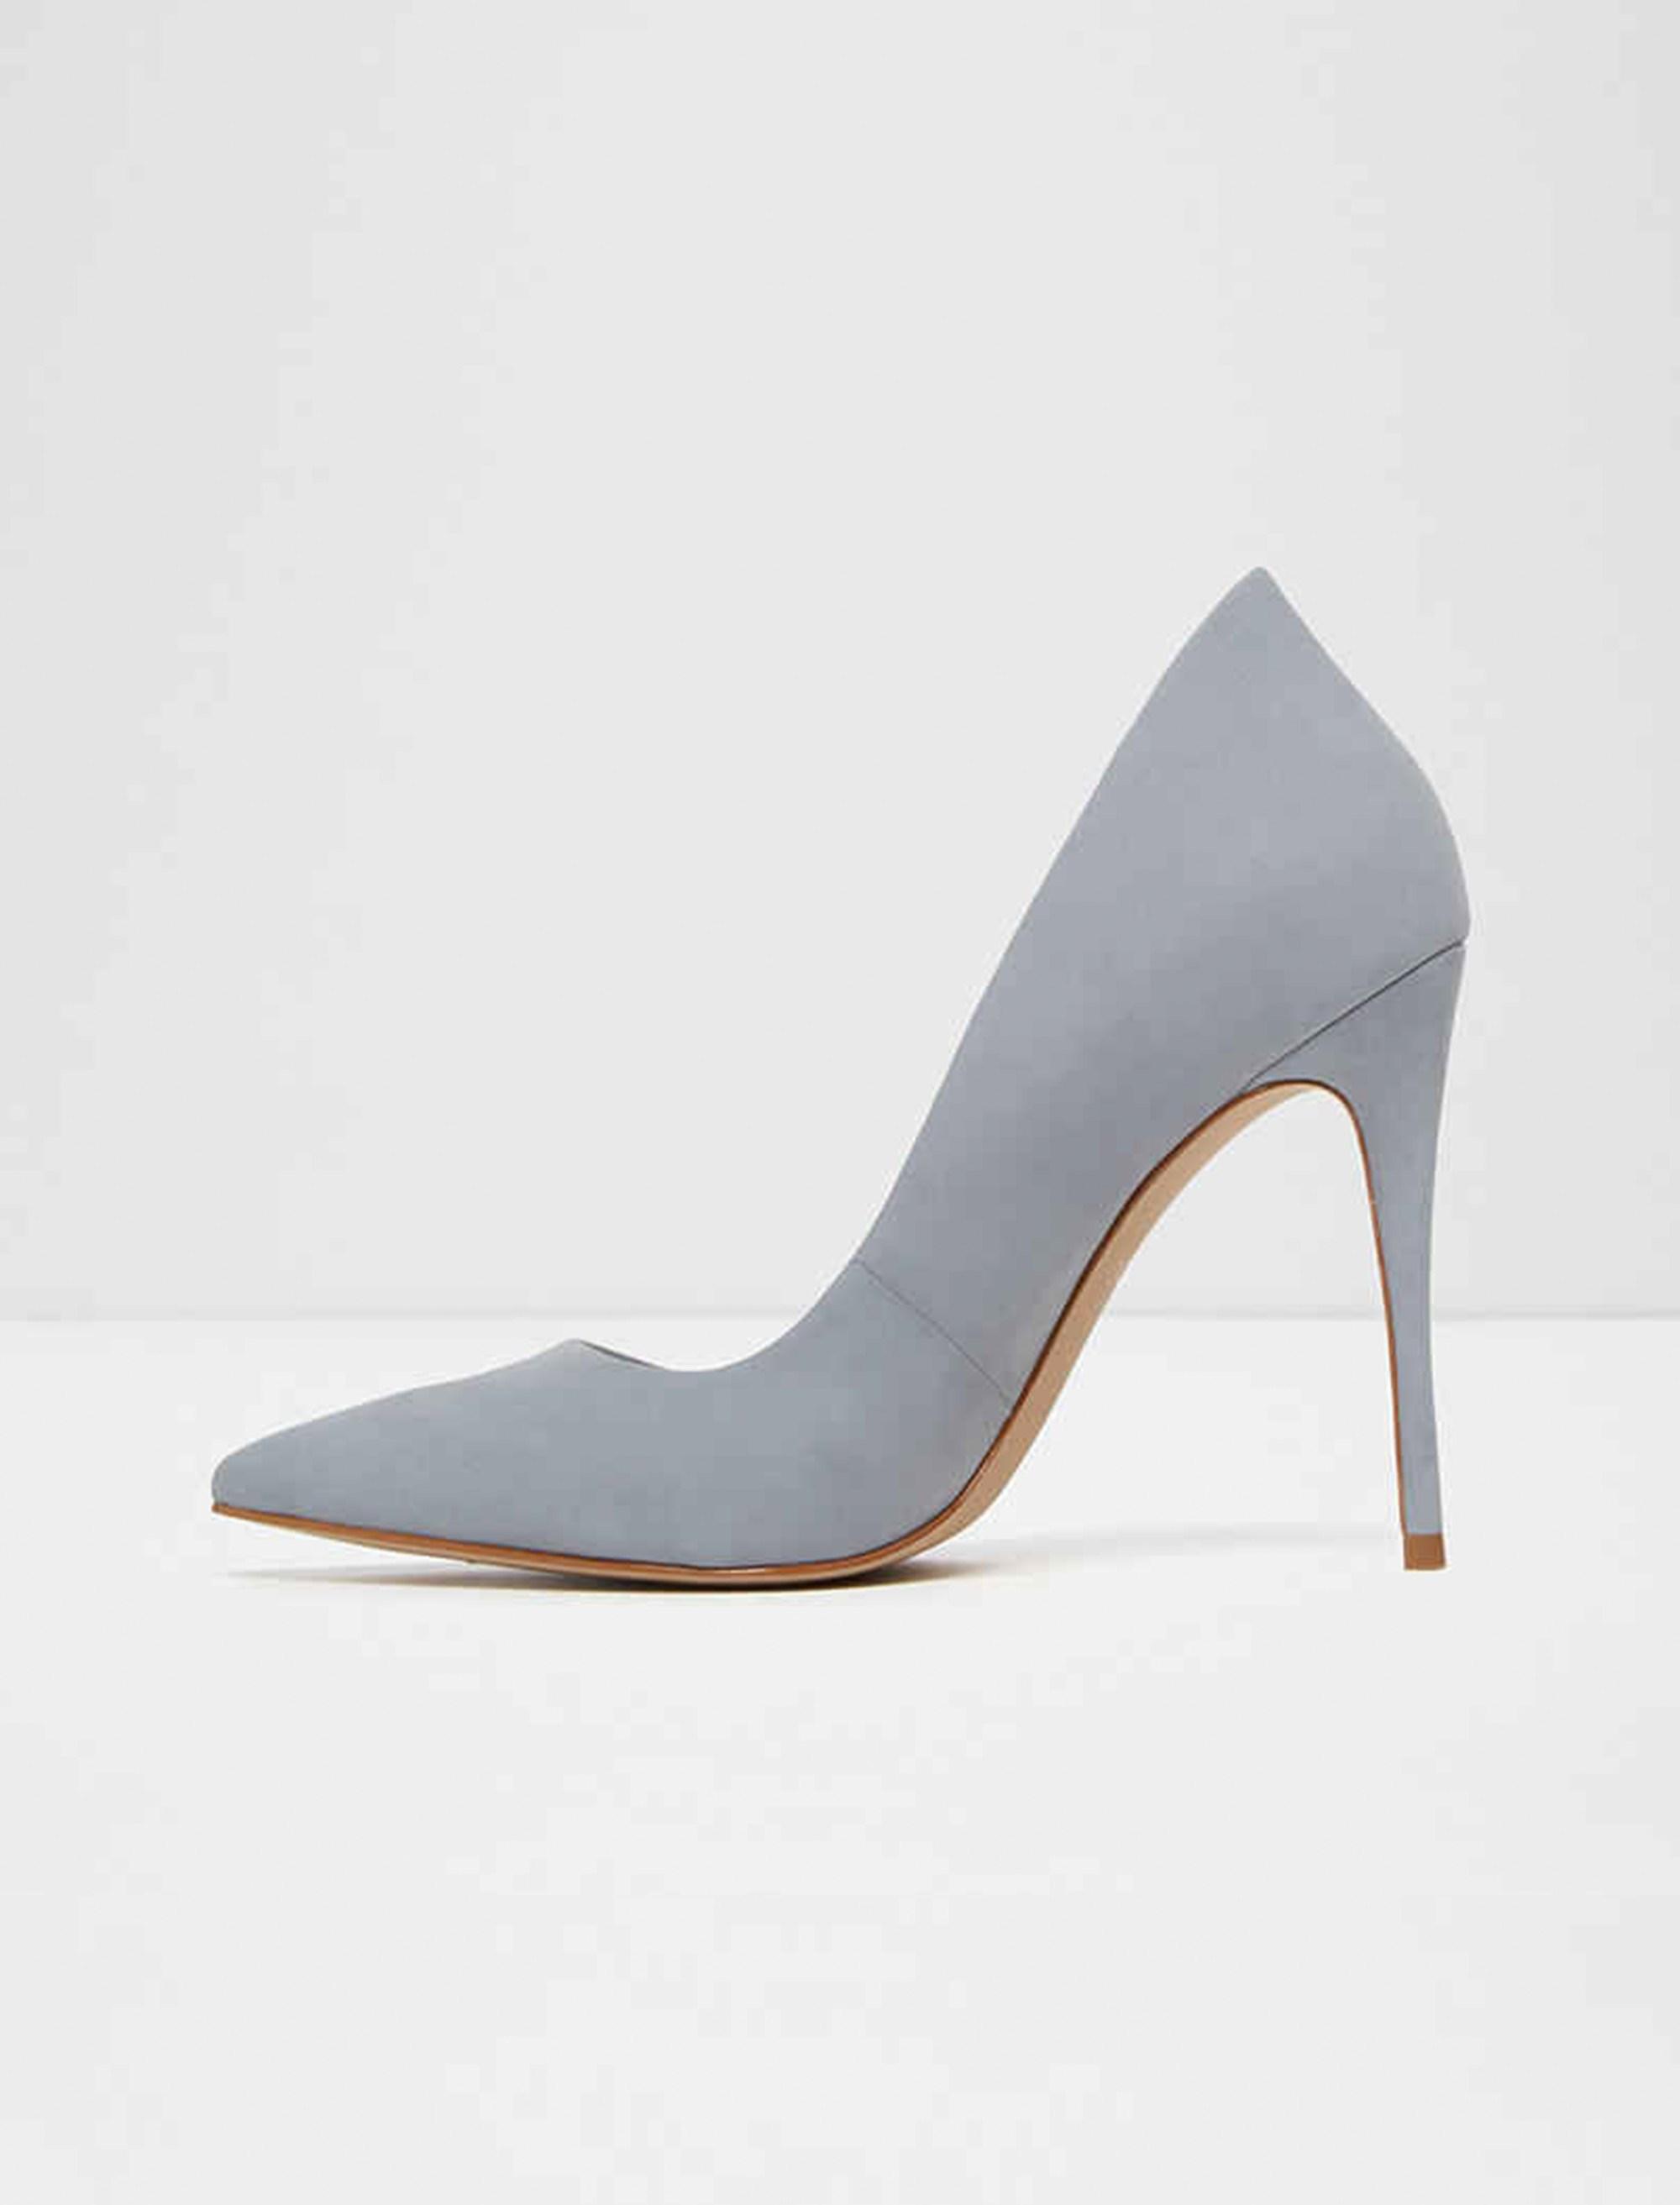 کفش پاشنه بلند نبوک زنانه - آبي  - 2